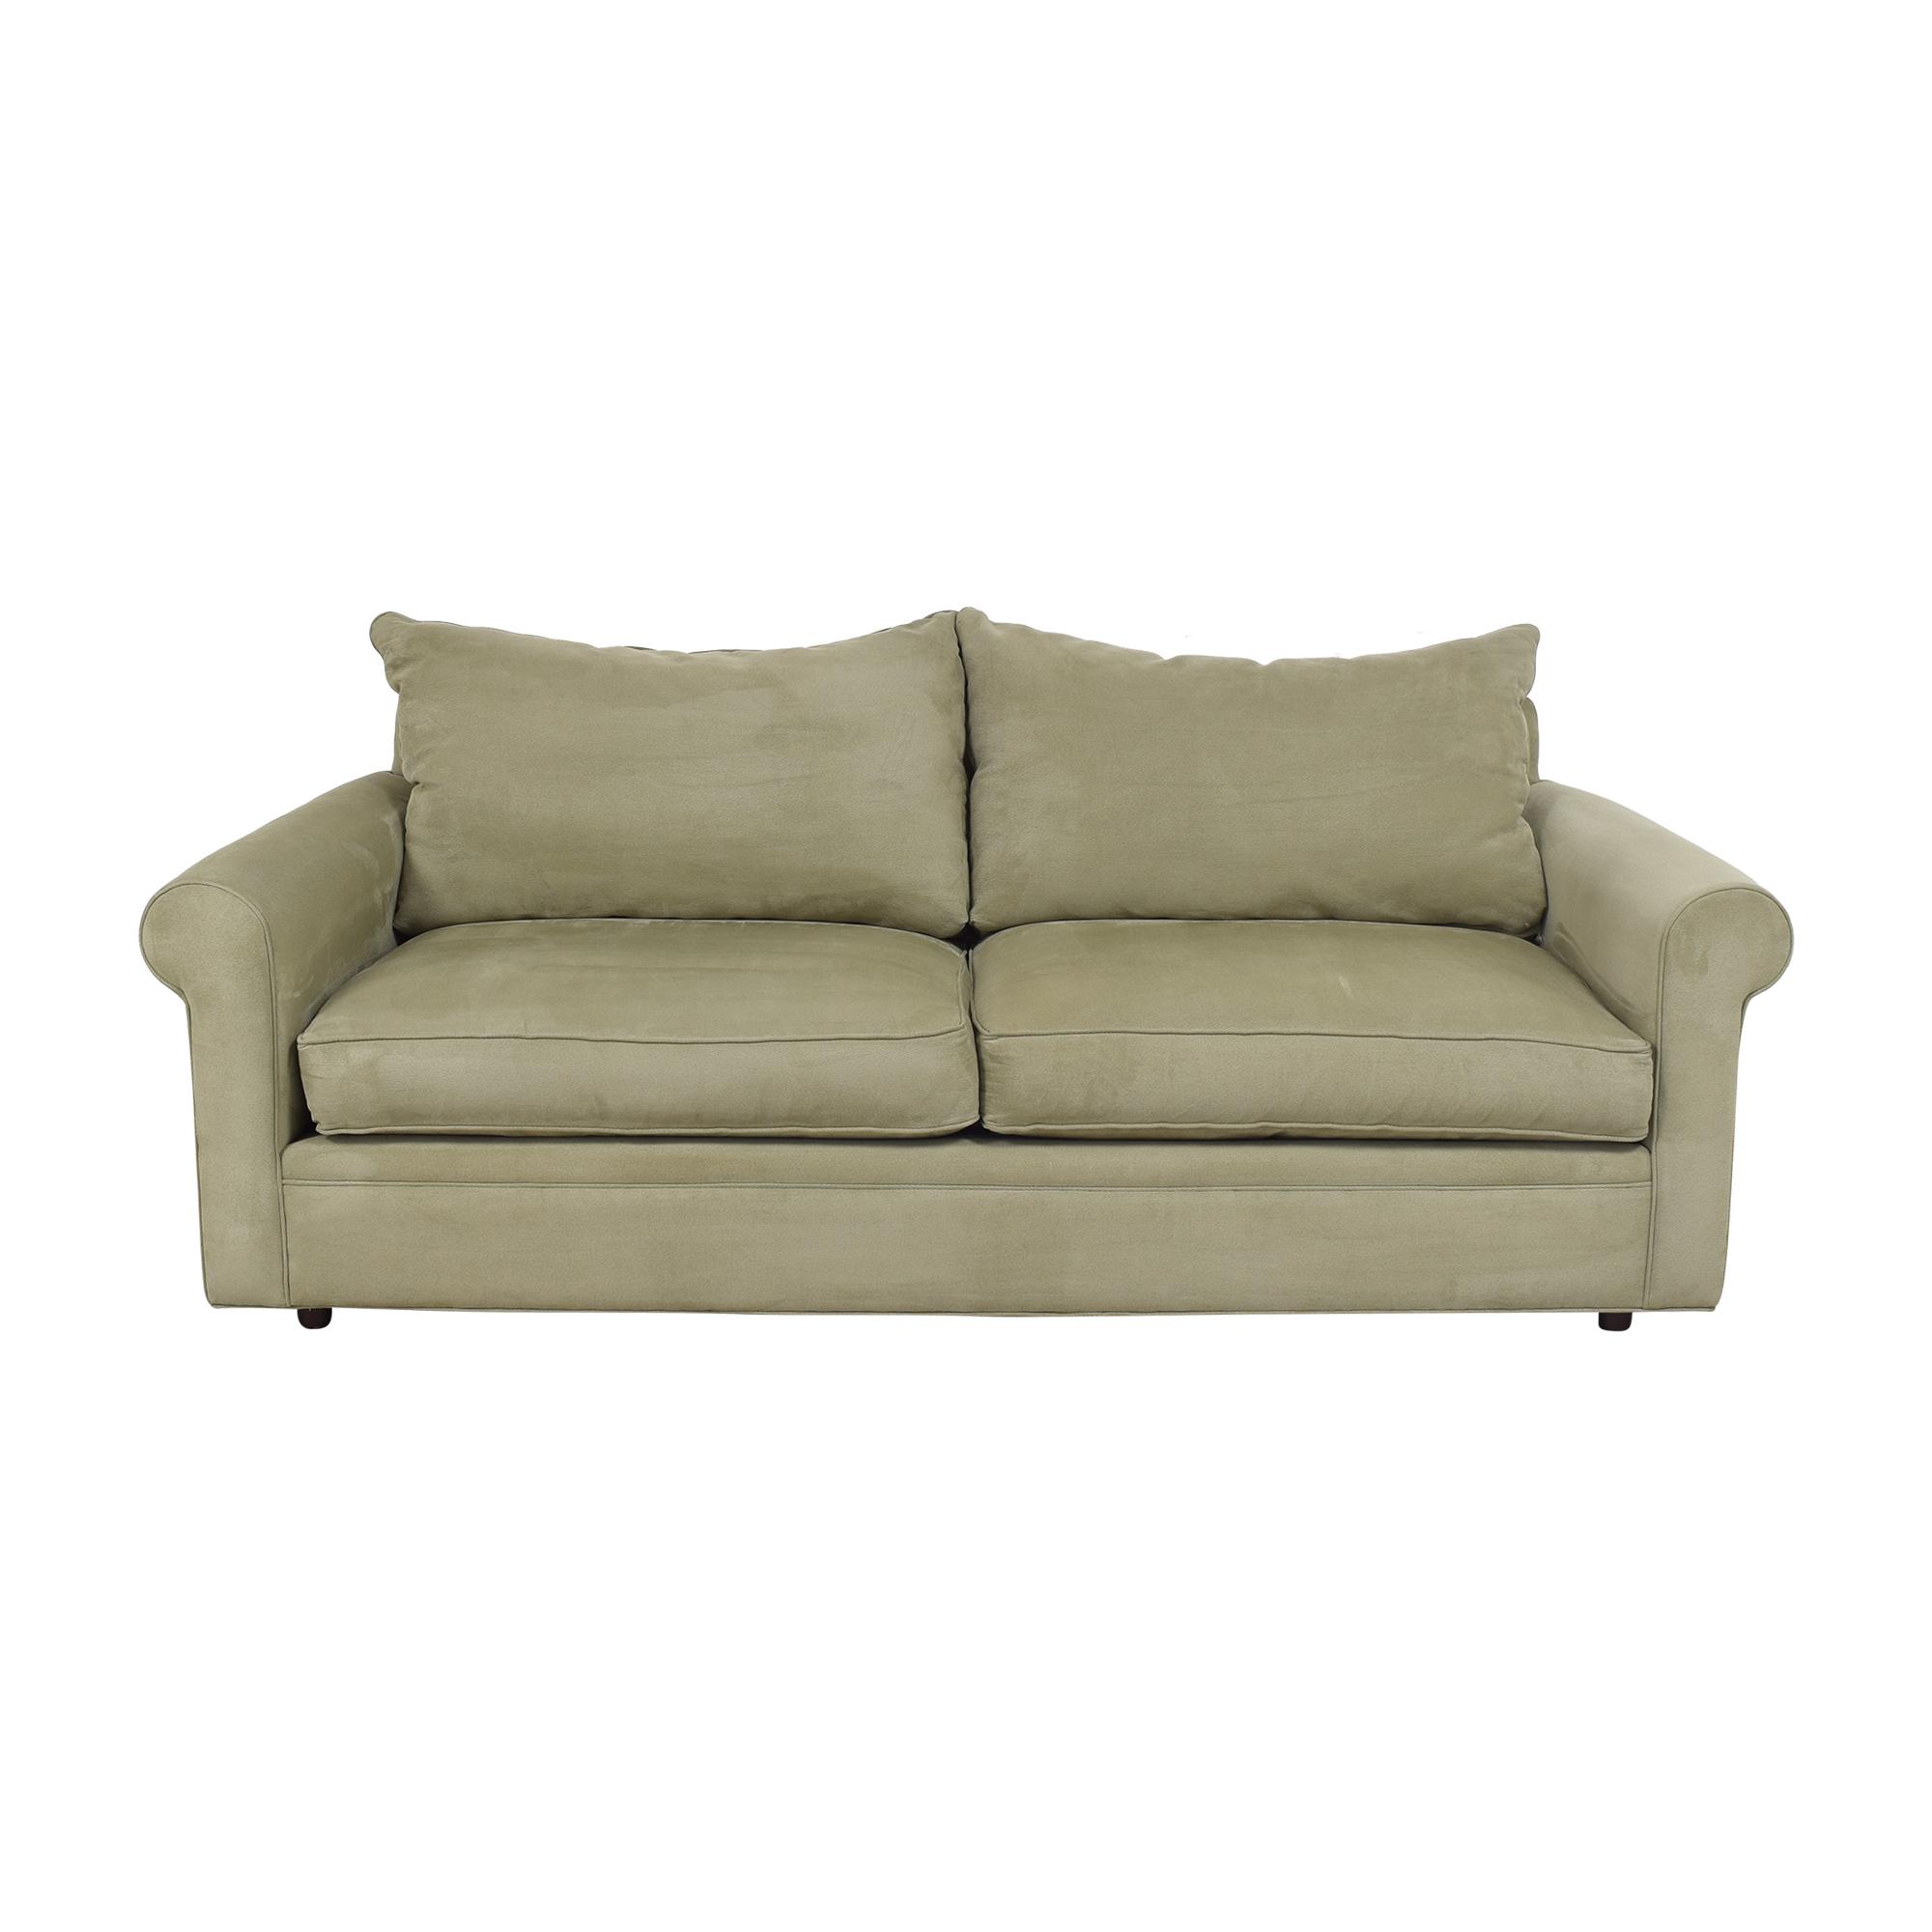 Macy's Modern Concepts Sofa / Classic Sofas